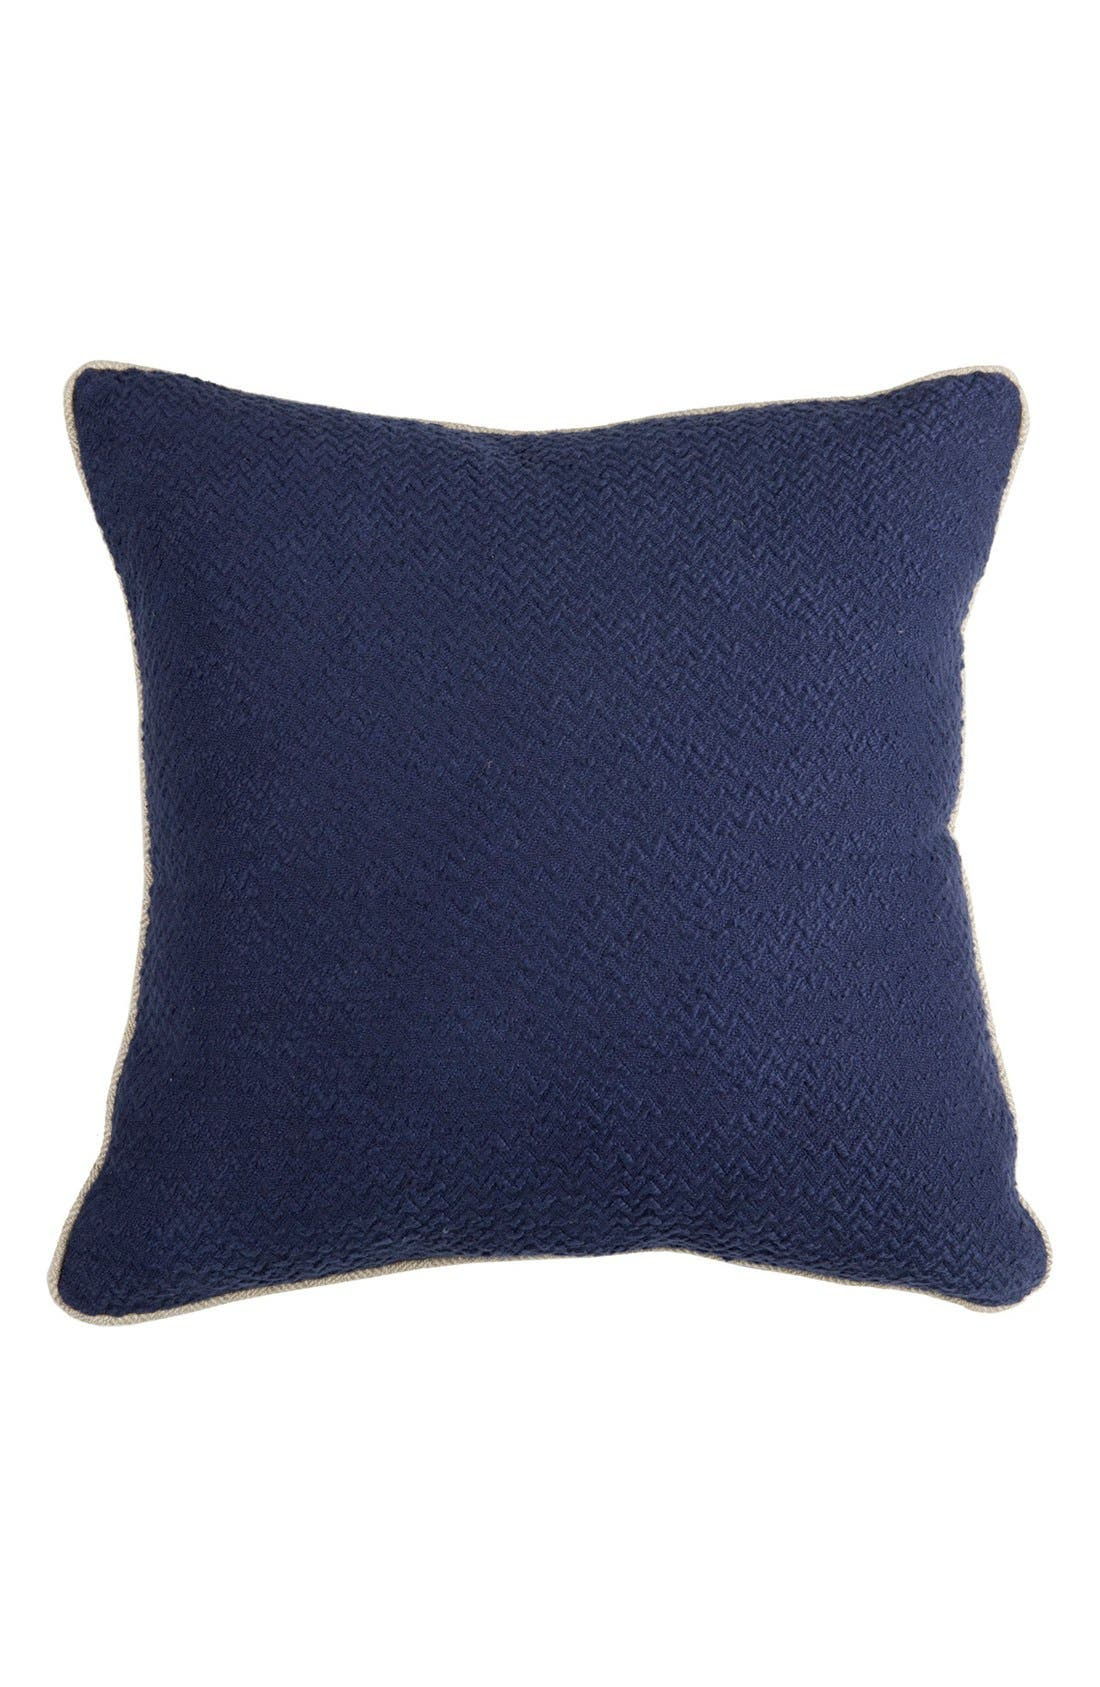 Alternate Image 1 Selected - Villa Home Collections 'Razia' Pillow